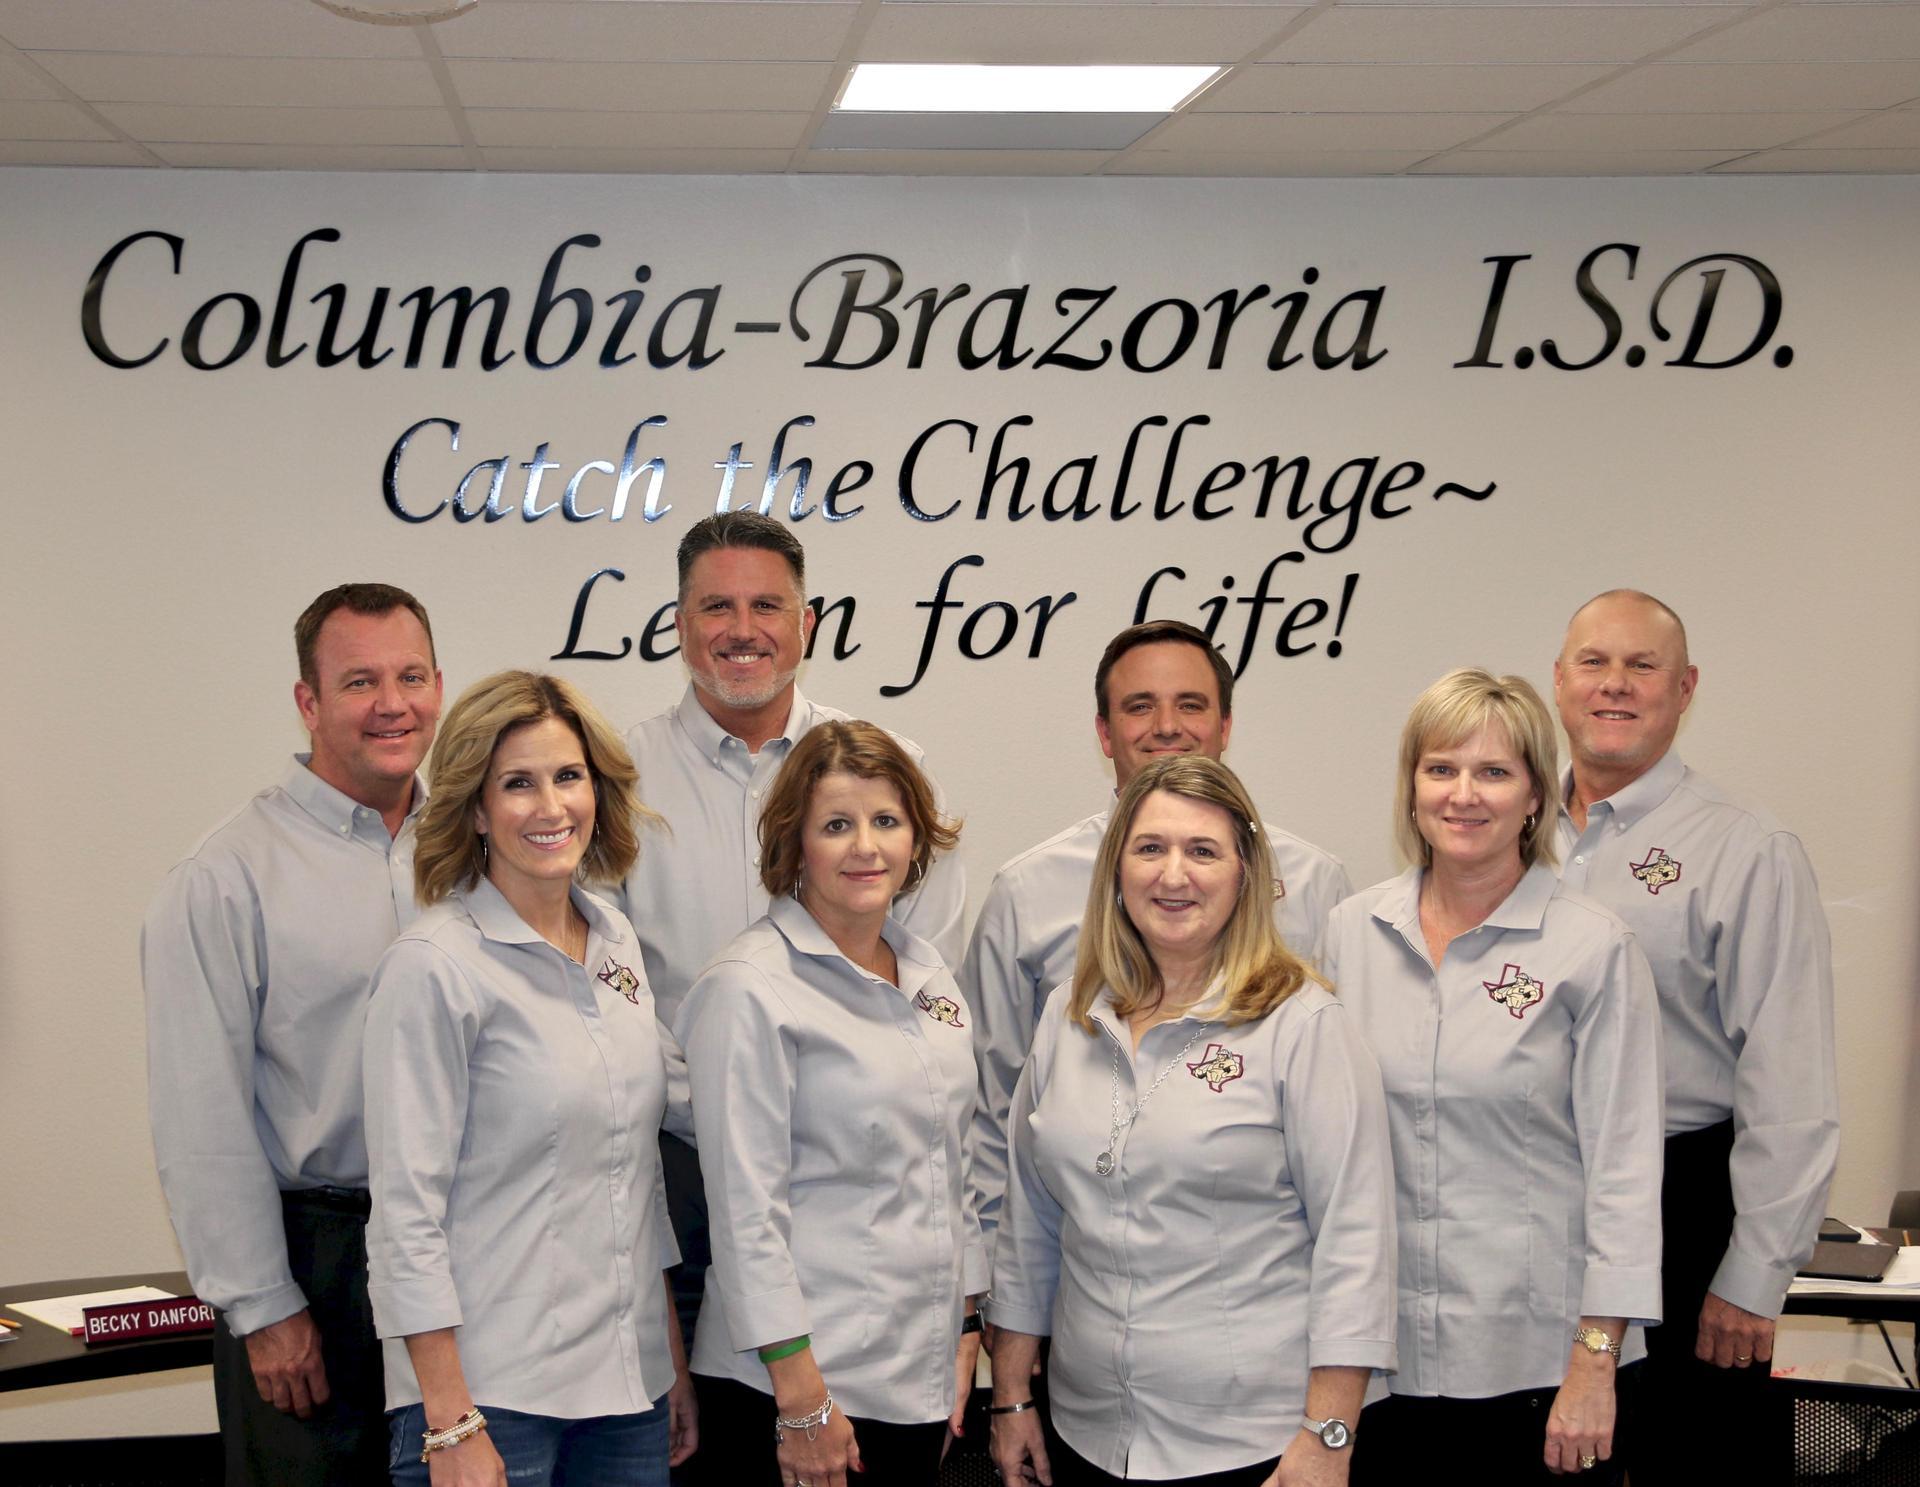 Columbia Brazoria Board of Truestees and CBISD Superintendant Steven Galloway